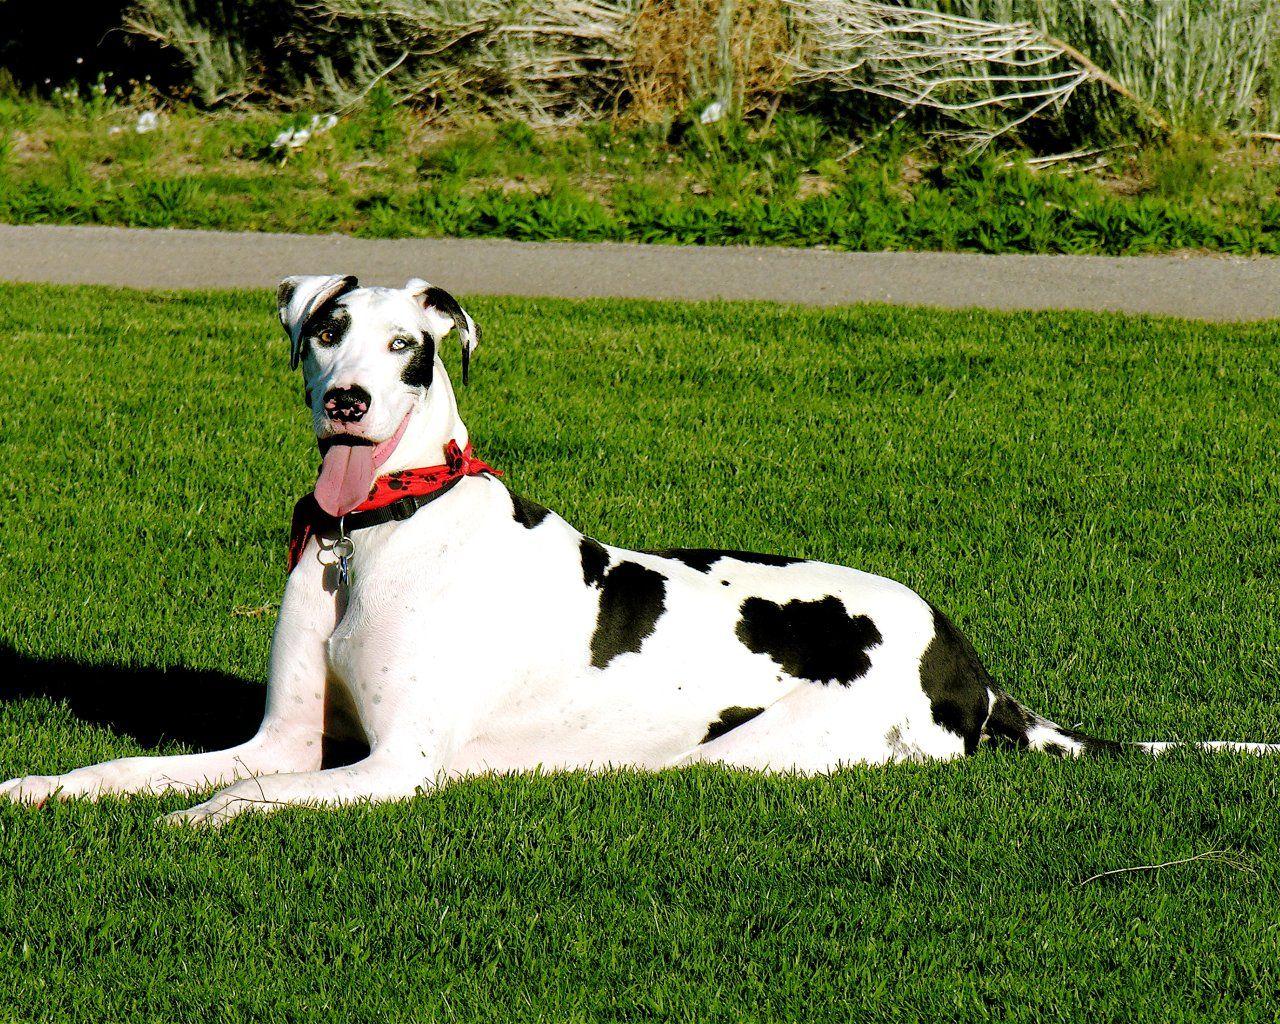 Great Dane Dogs And Puppies Great Dane Wallpaper Great Dane